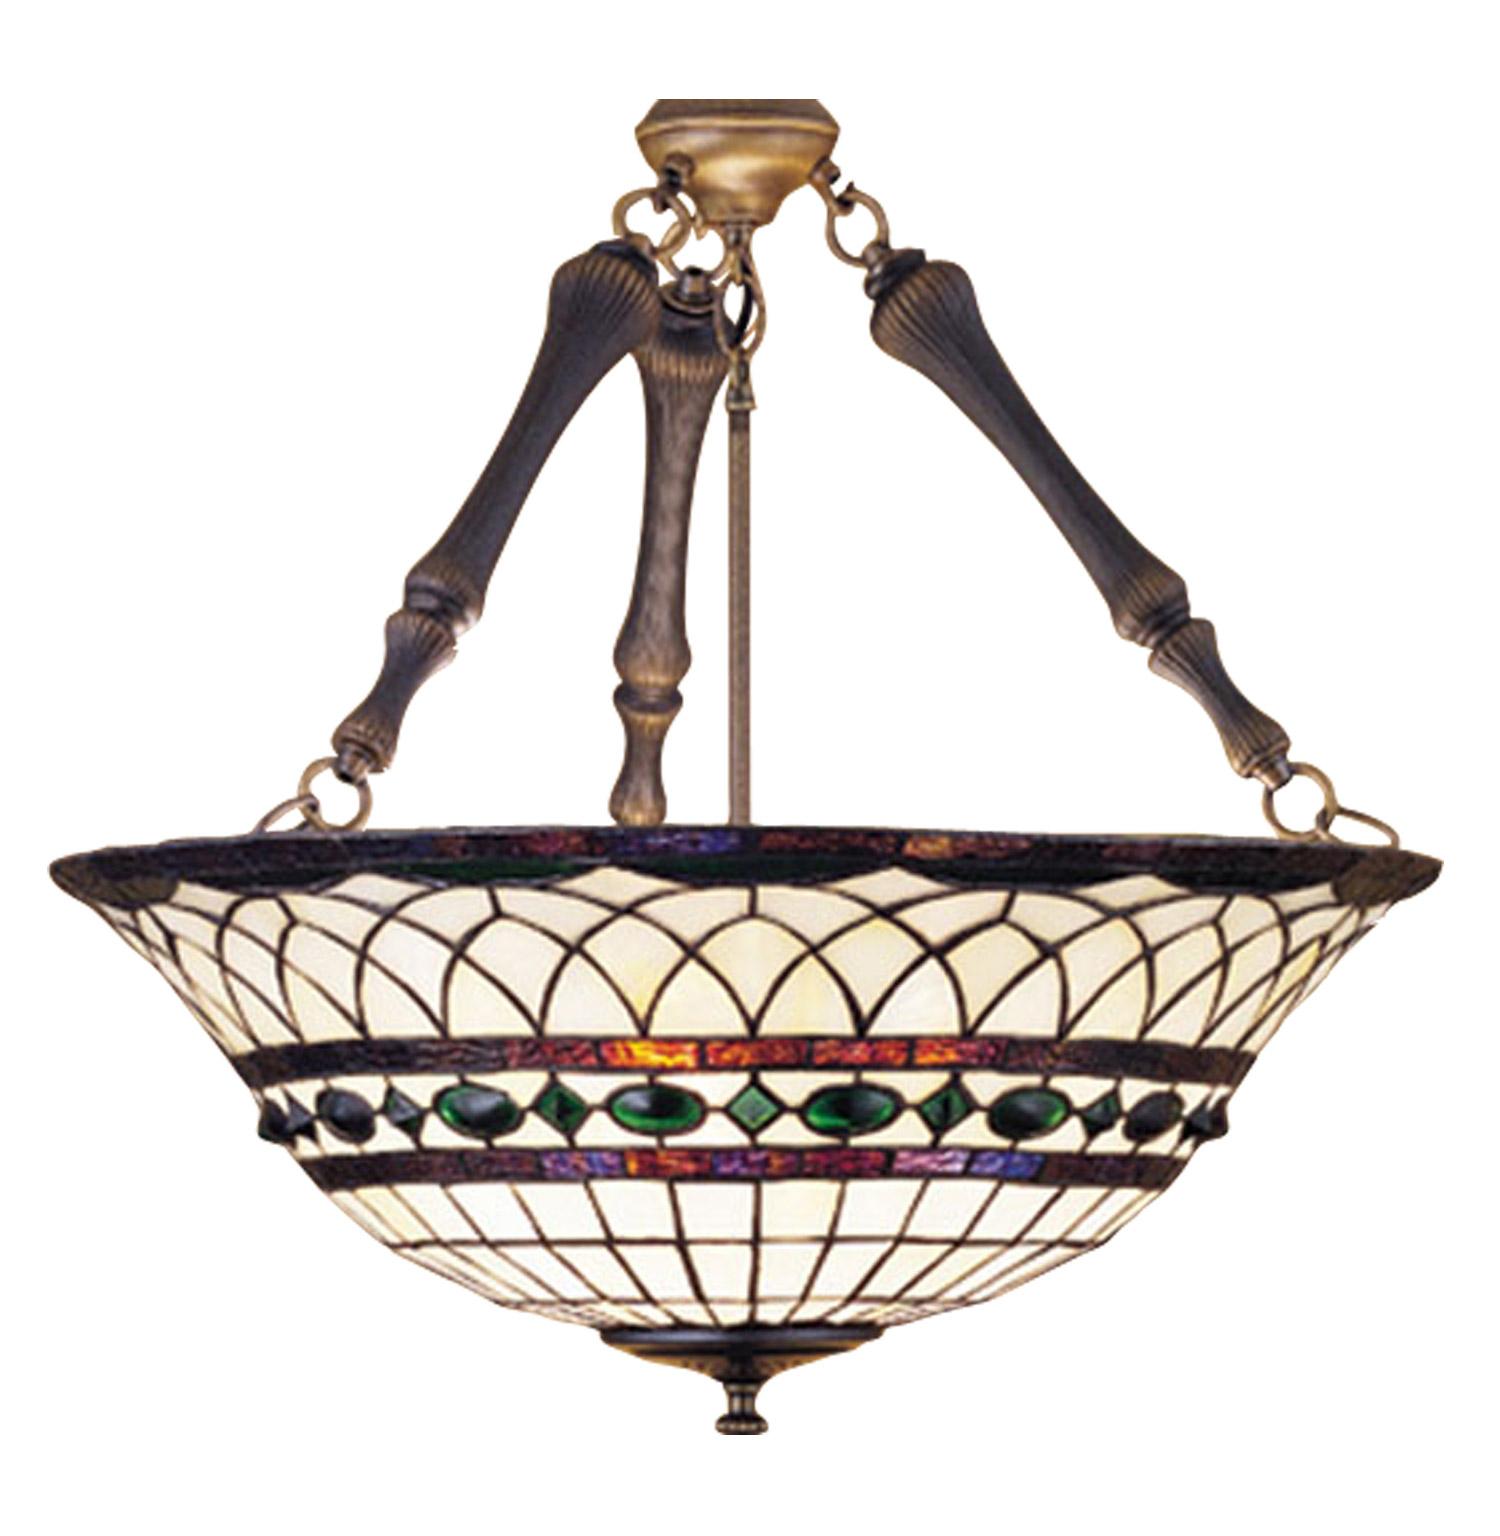 Meyda 30468 Tiffany Roman Inverted Hanging Lamp